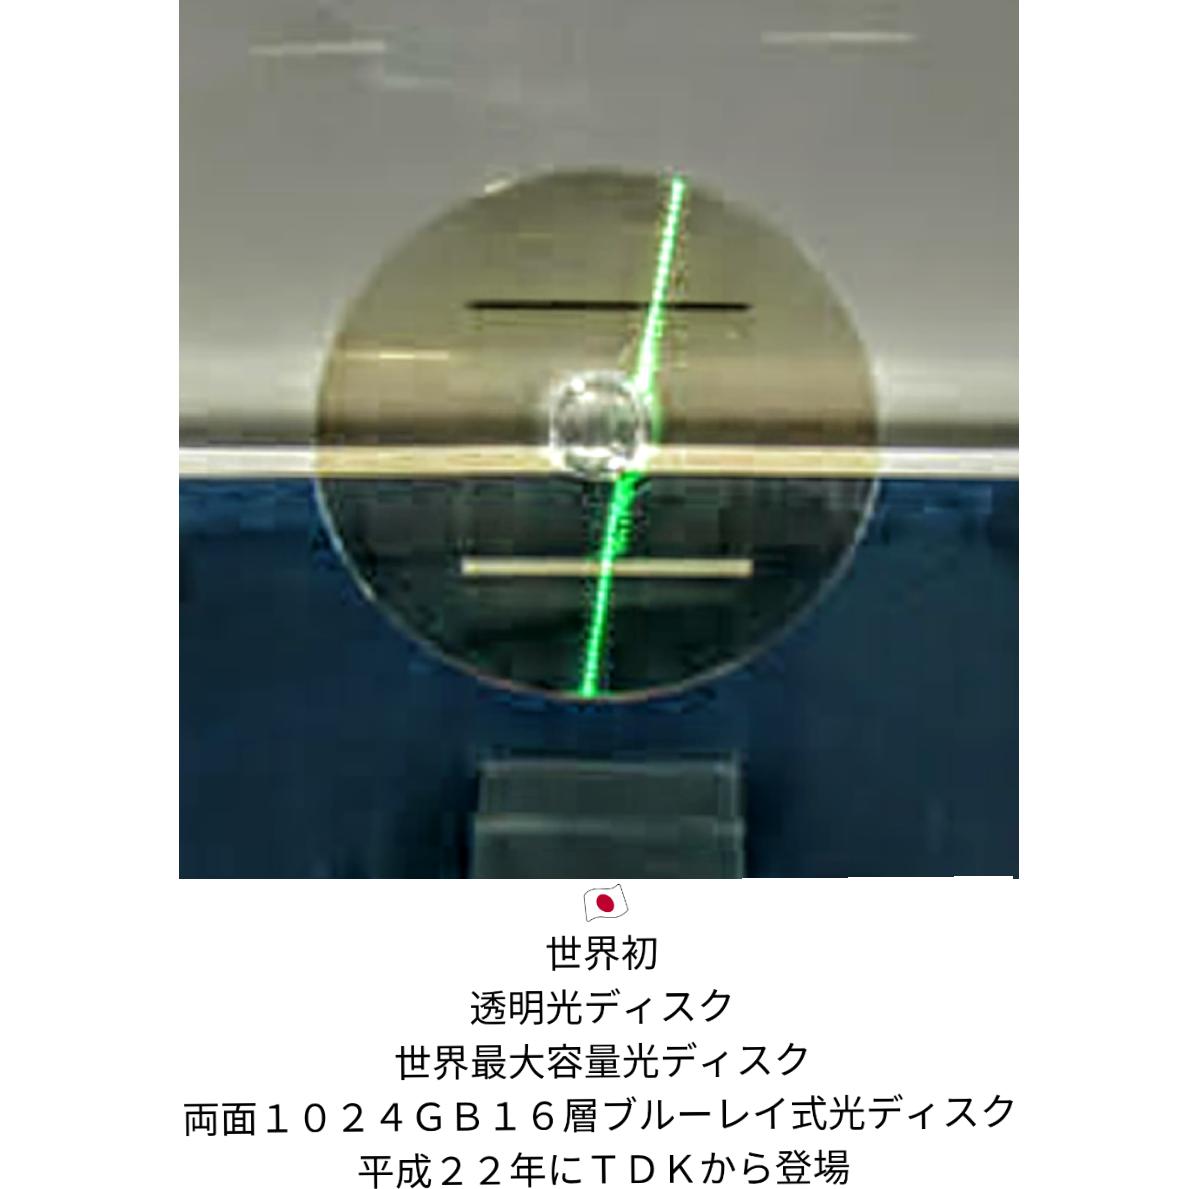 f:id:japanfather:20210424172154p:plain